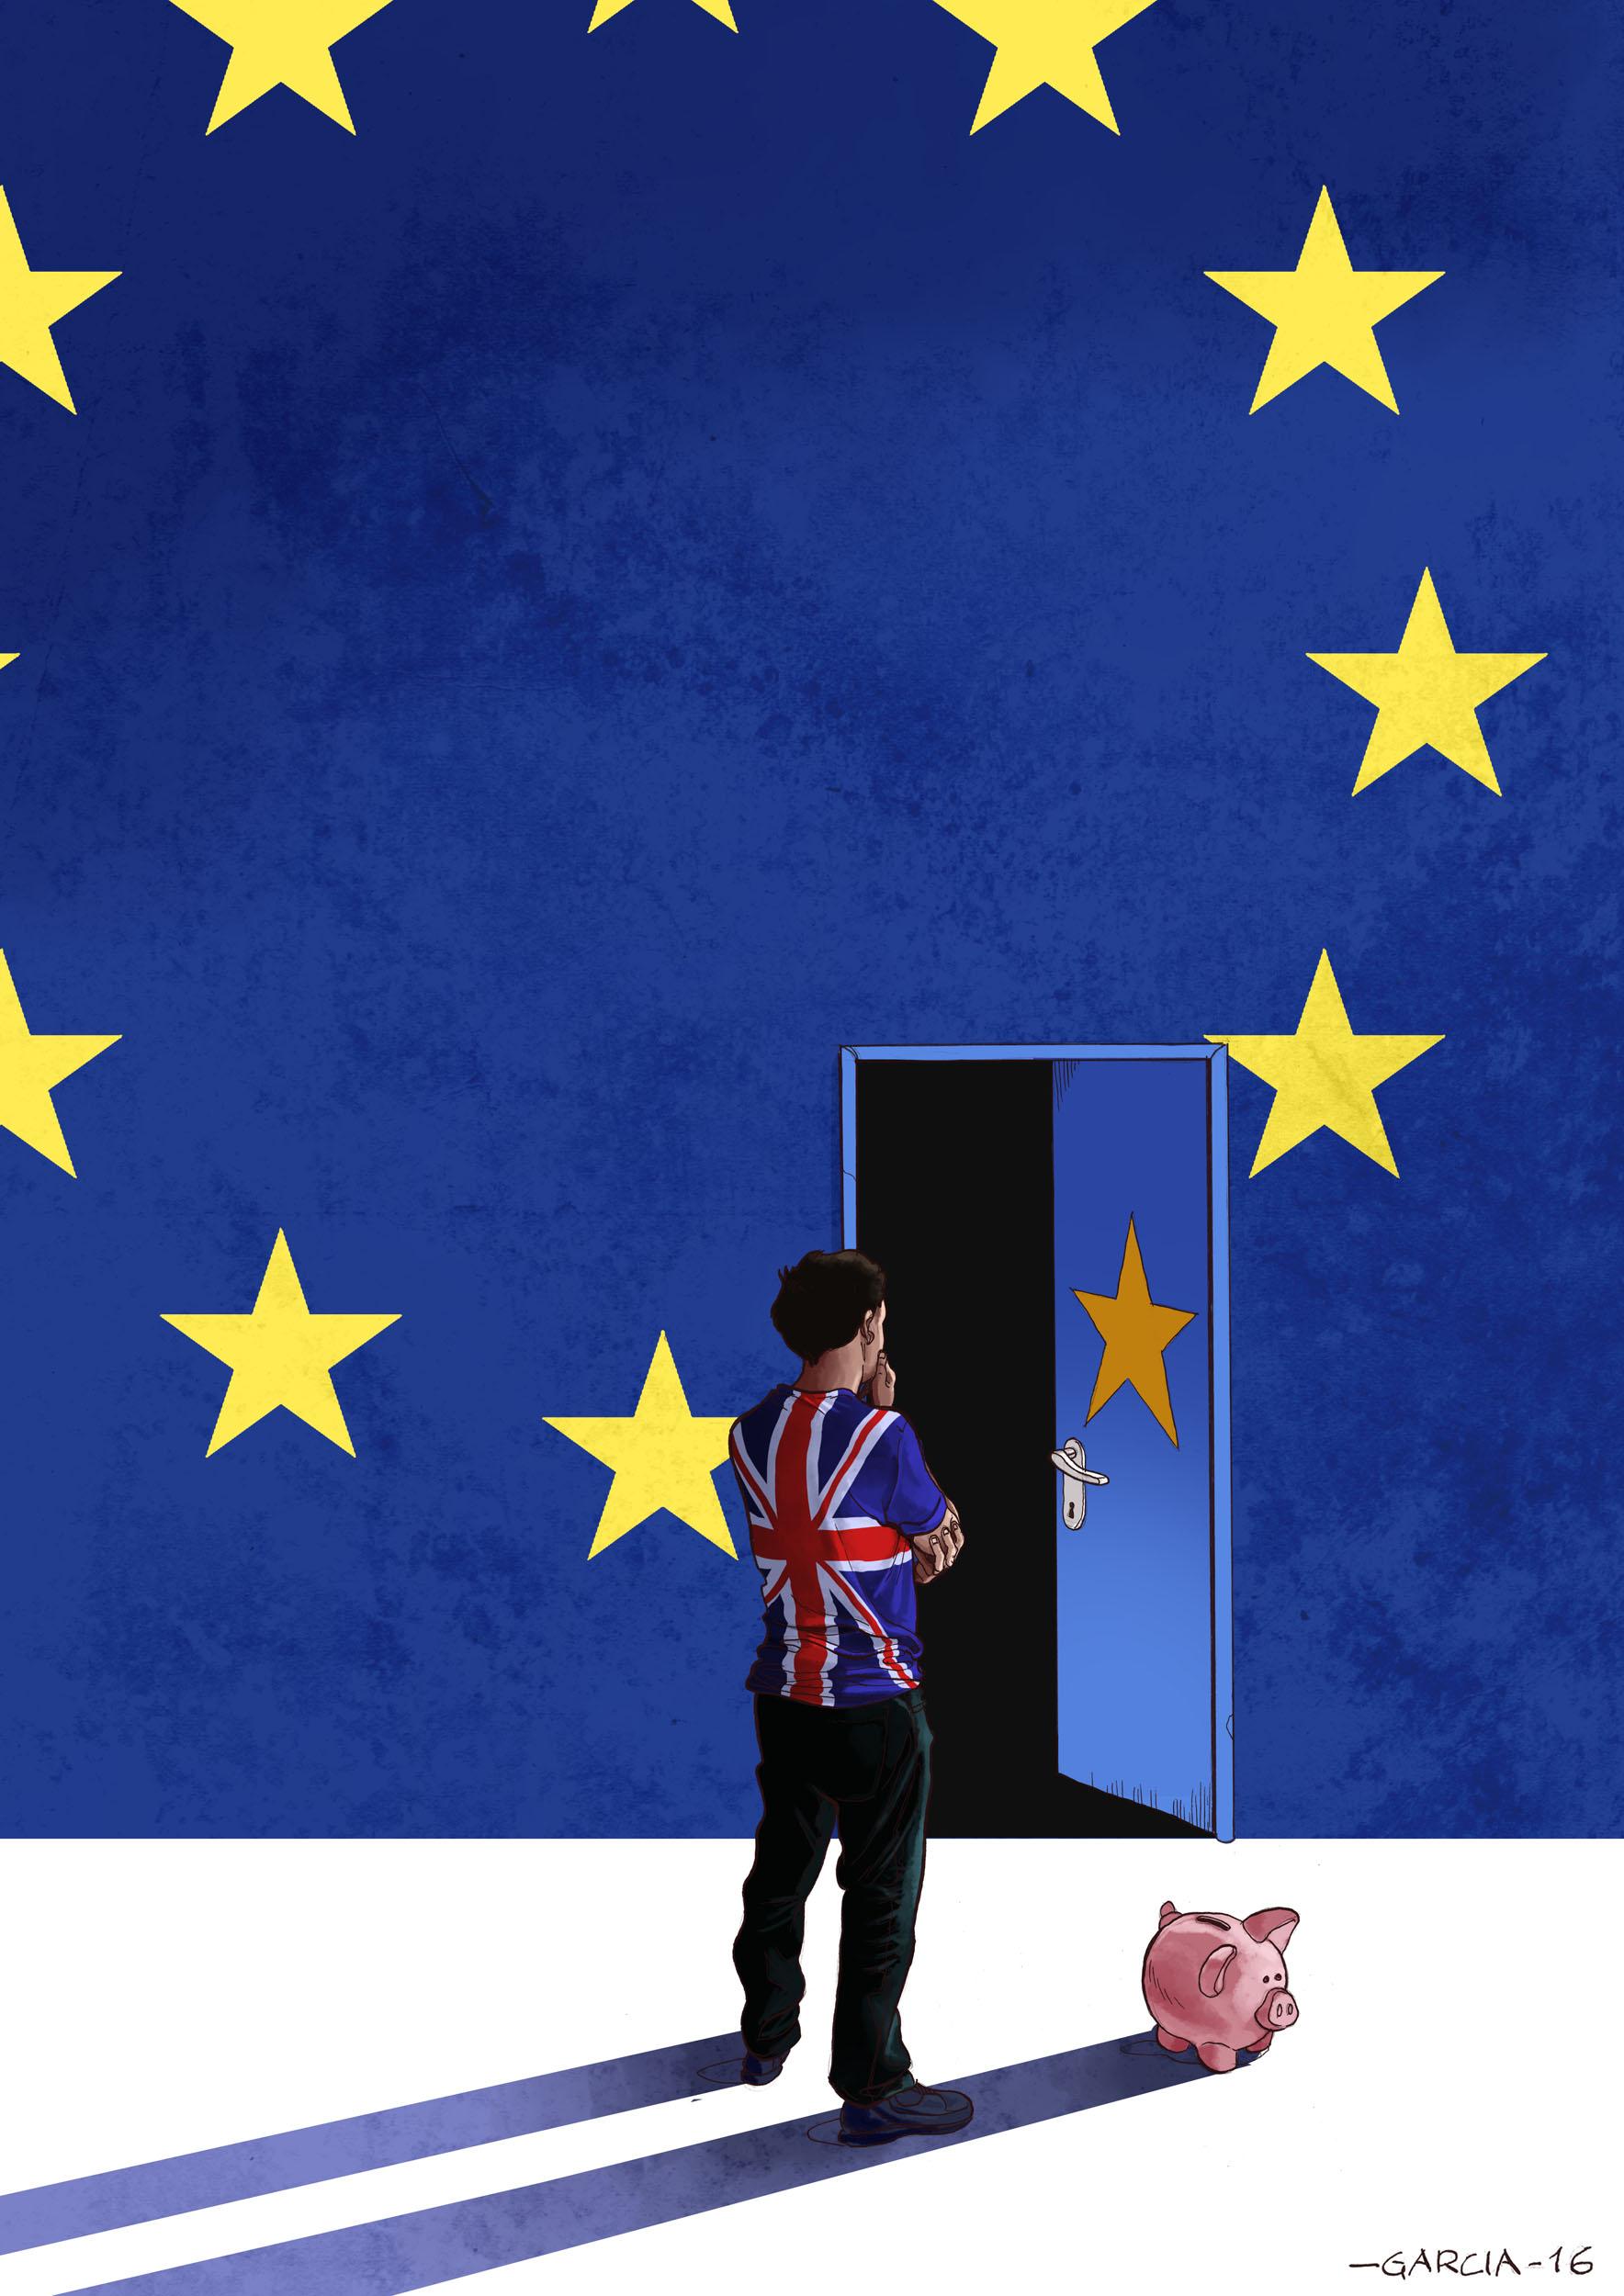 Daniel Garcia c2016 - Illustration Brexit UK Europe Referendum